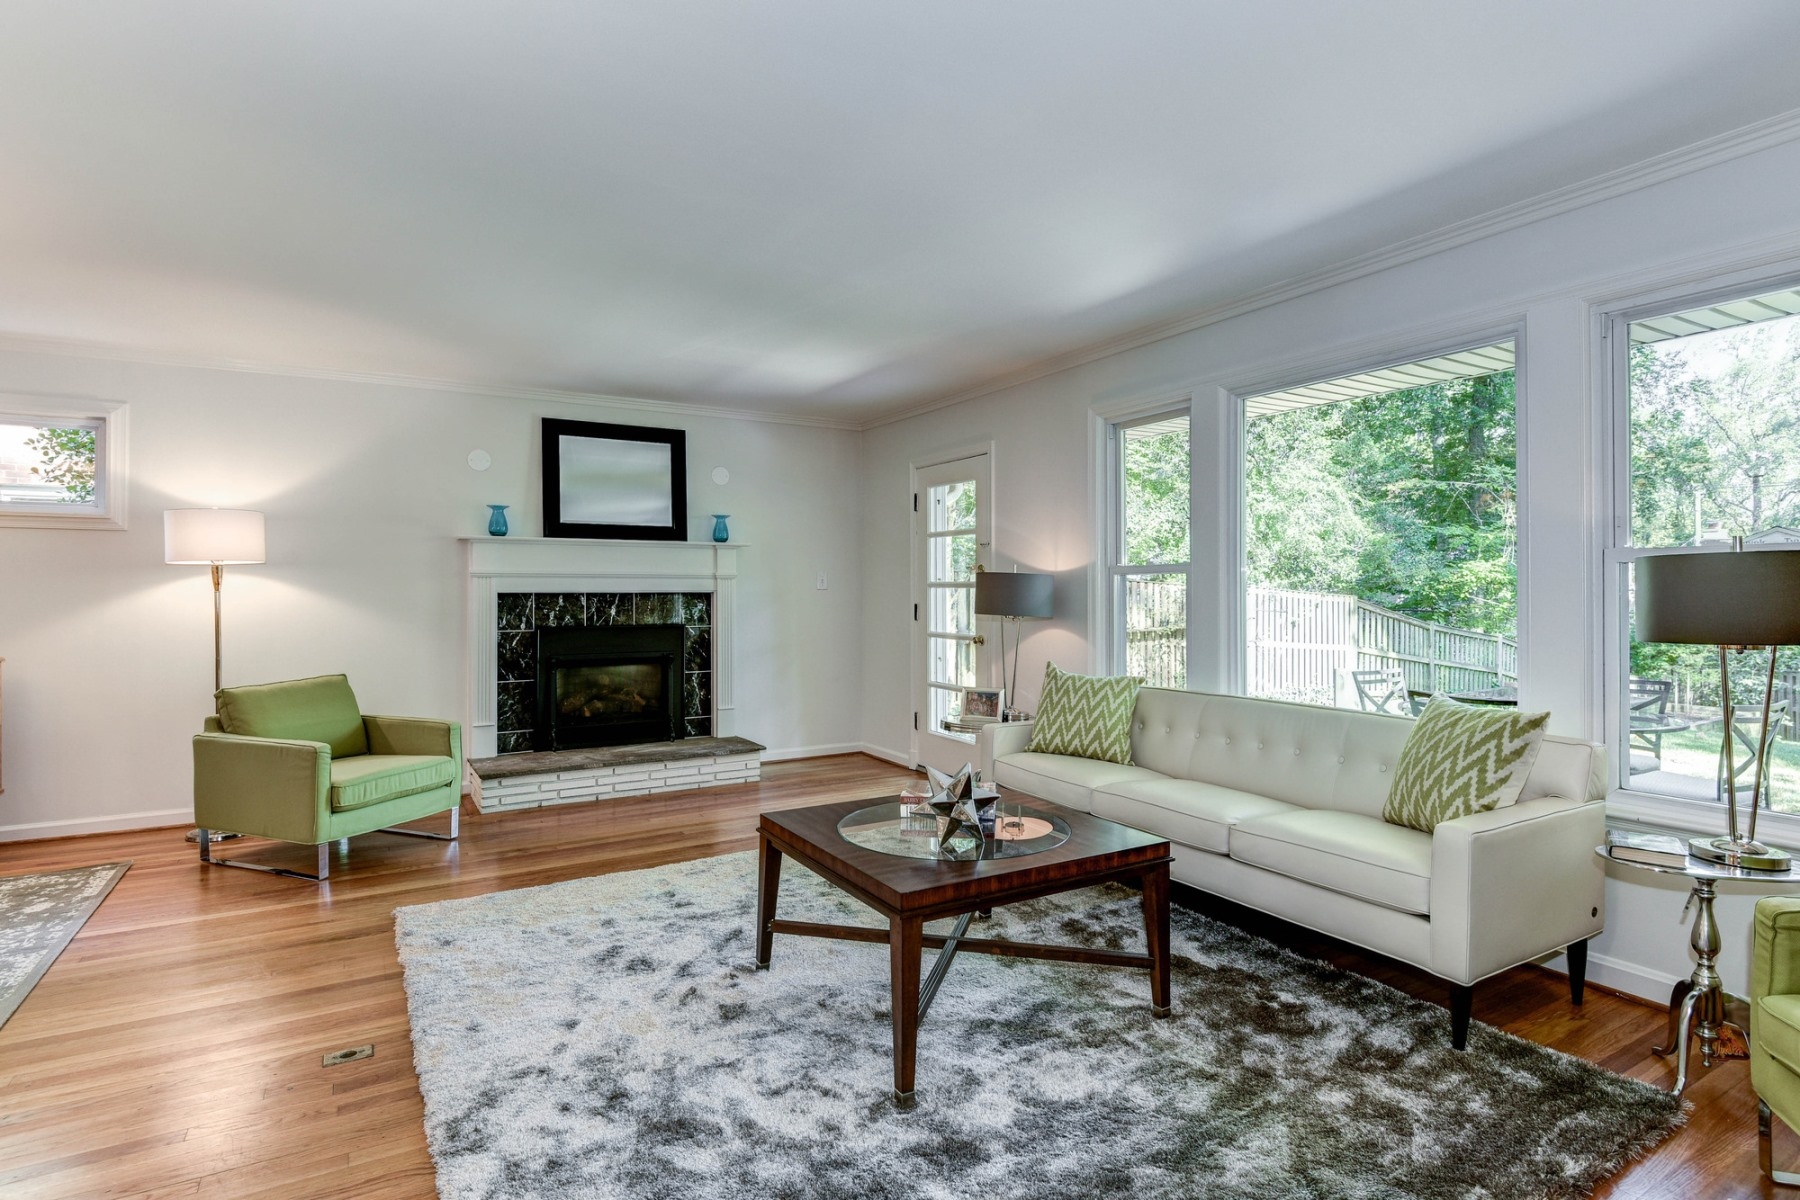 Property For Sale at 3249 Arcadia Place Nw, Washington